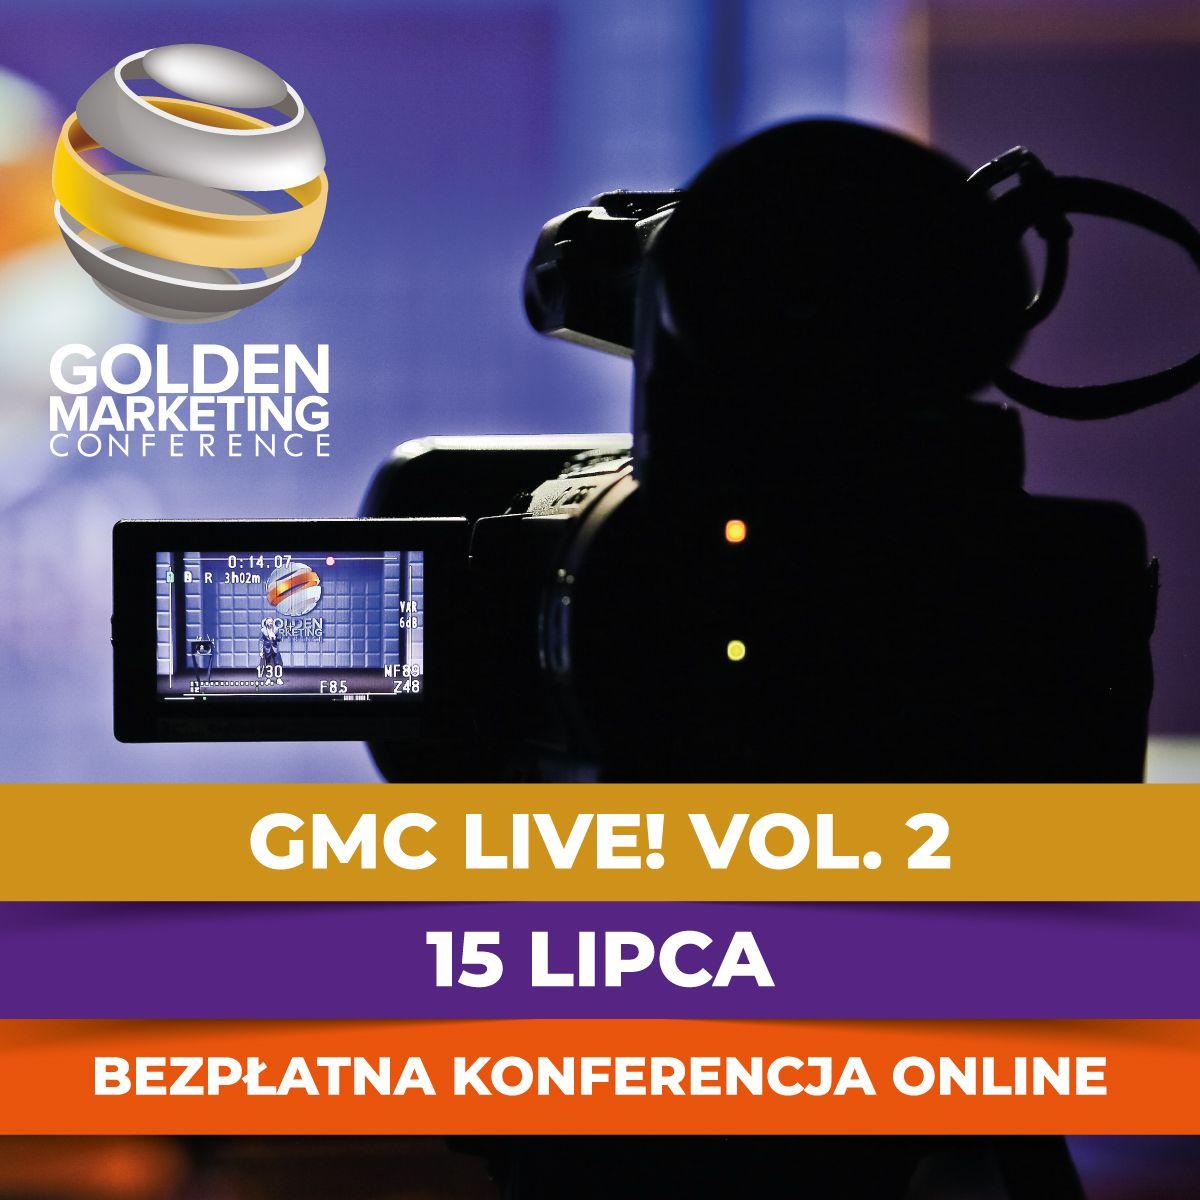 GMC Live! vol. 2 – już 15 lipca